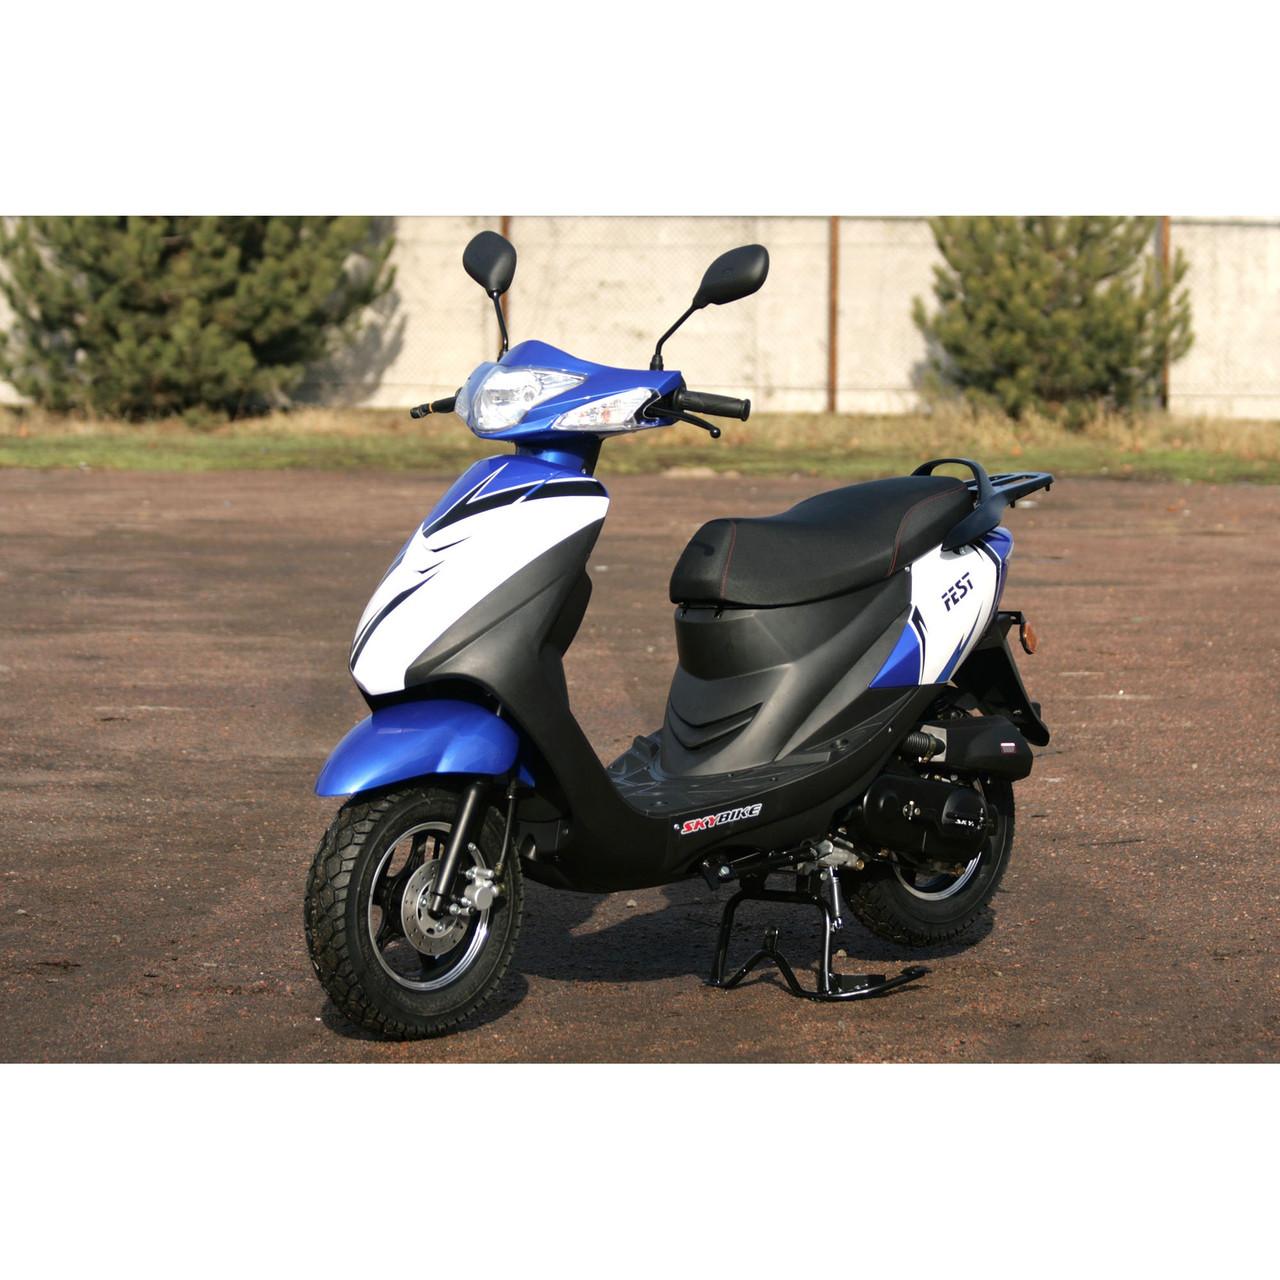 Скутер 4х тактный одноцилиндровый FEST-80 Skybike